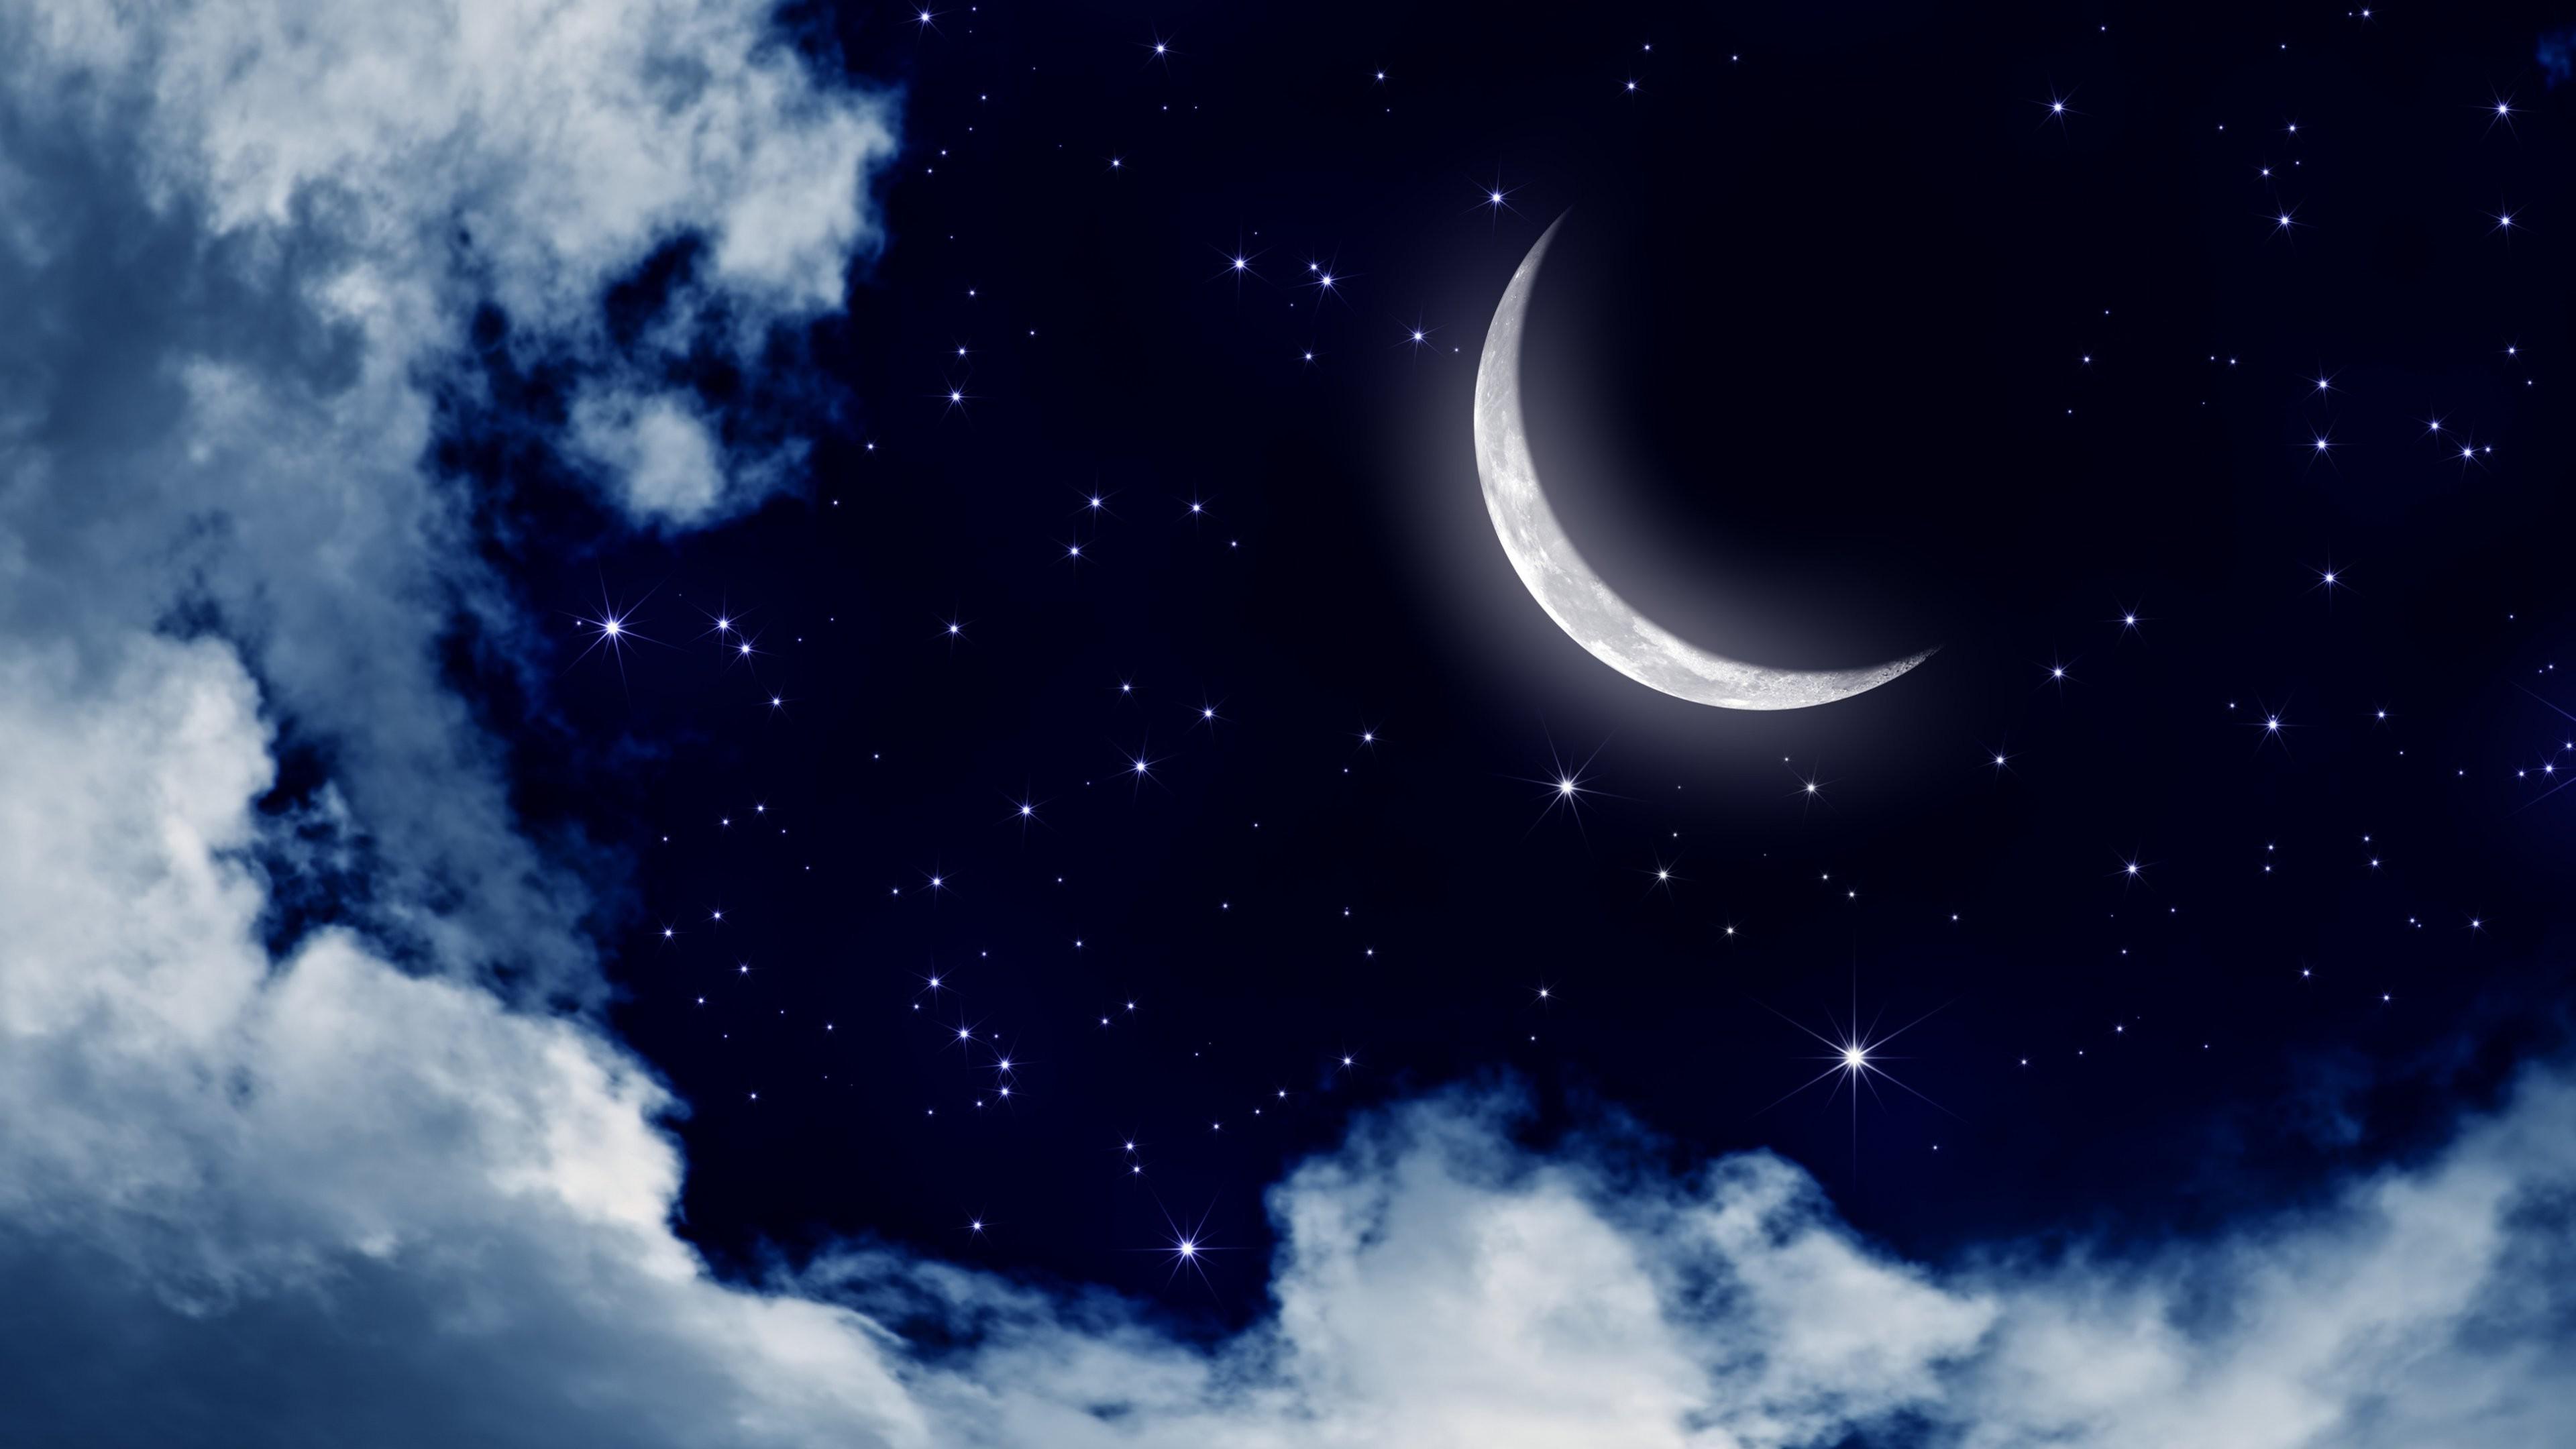 Night Sky Moon Background